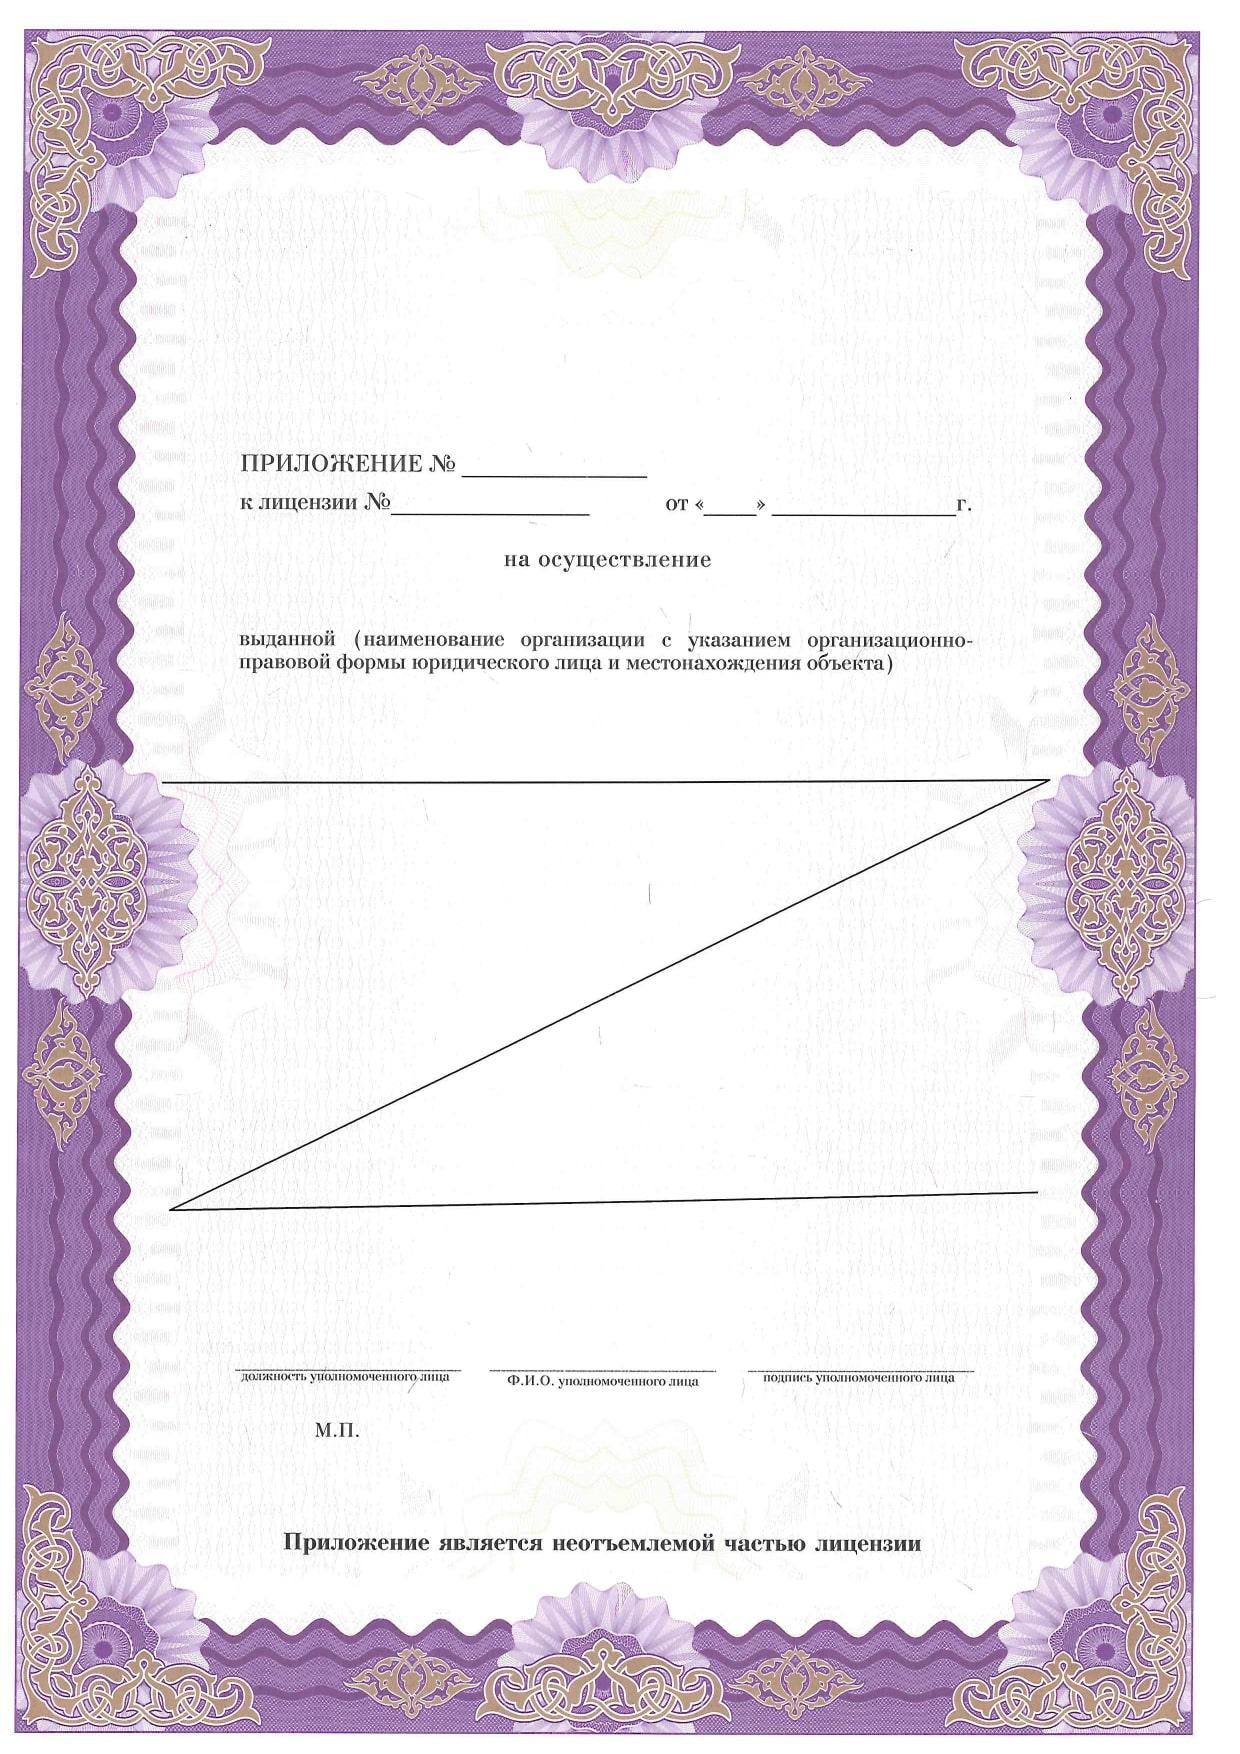 Licenzia-geradez-4.jpg